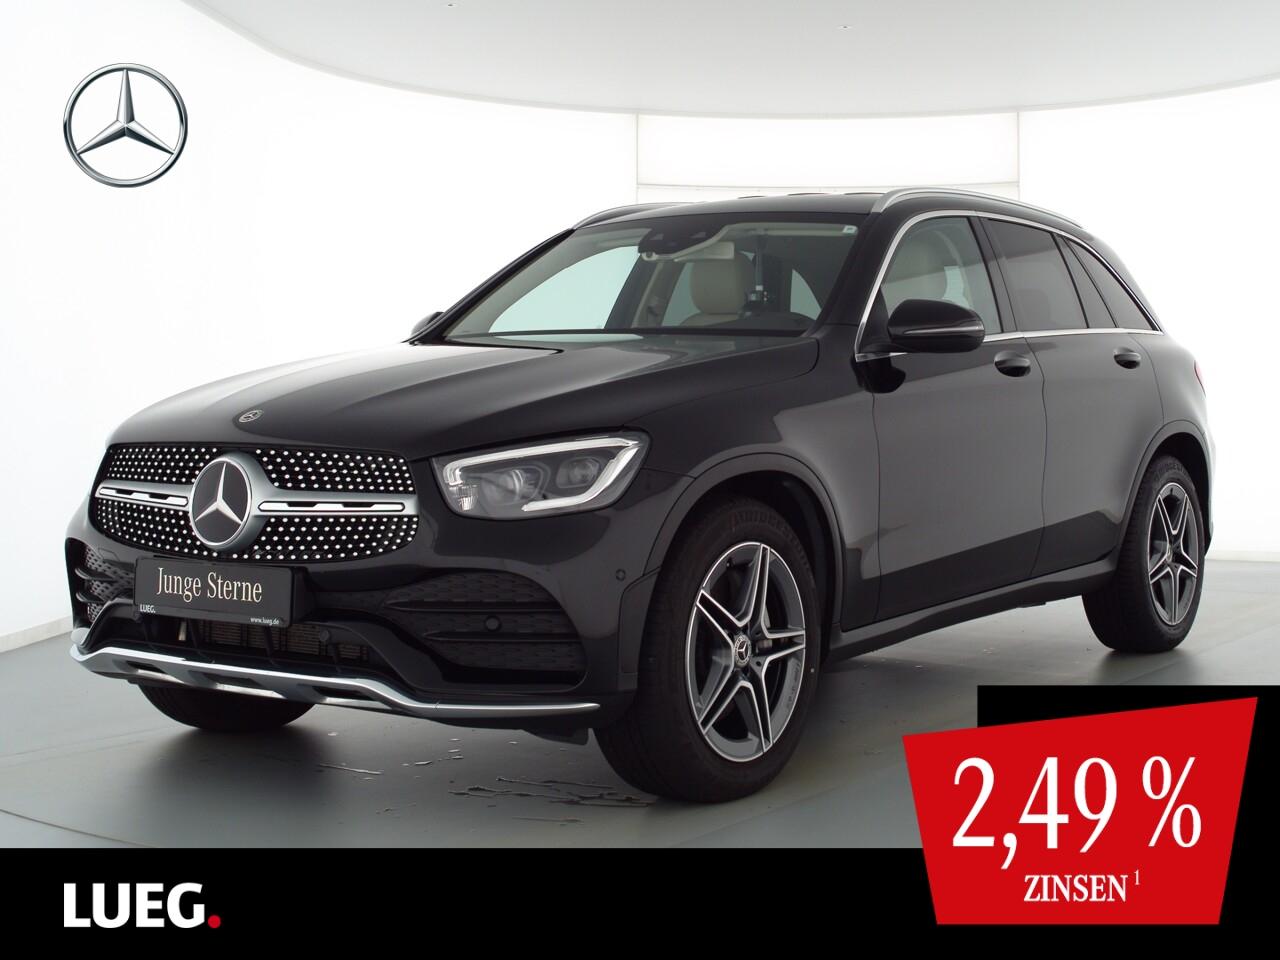 Mercedes-Benz GLC 200 4M AMG+MBUX+Mbeam+Distr+Mem+EHeck+Kamera, Jahr 2020, Benzin